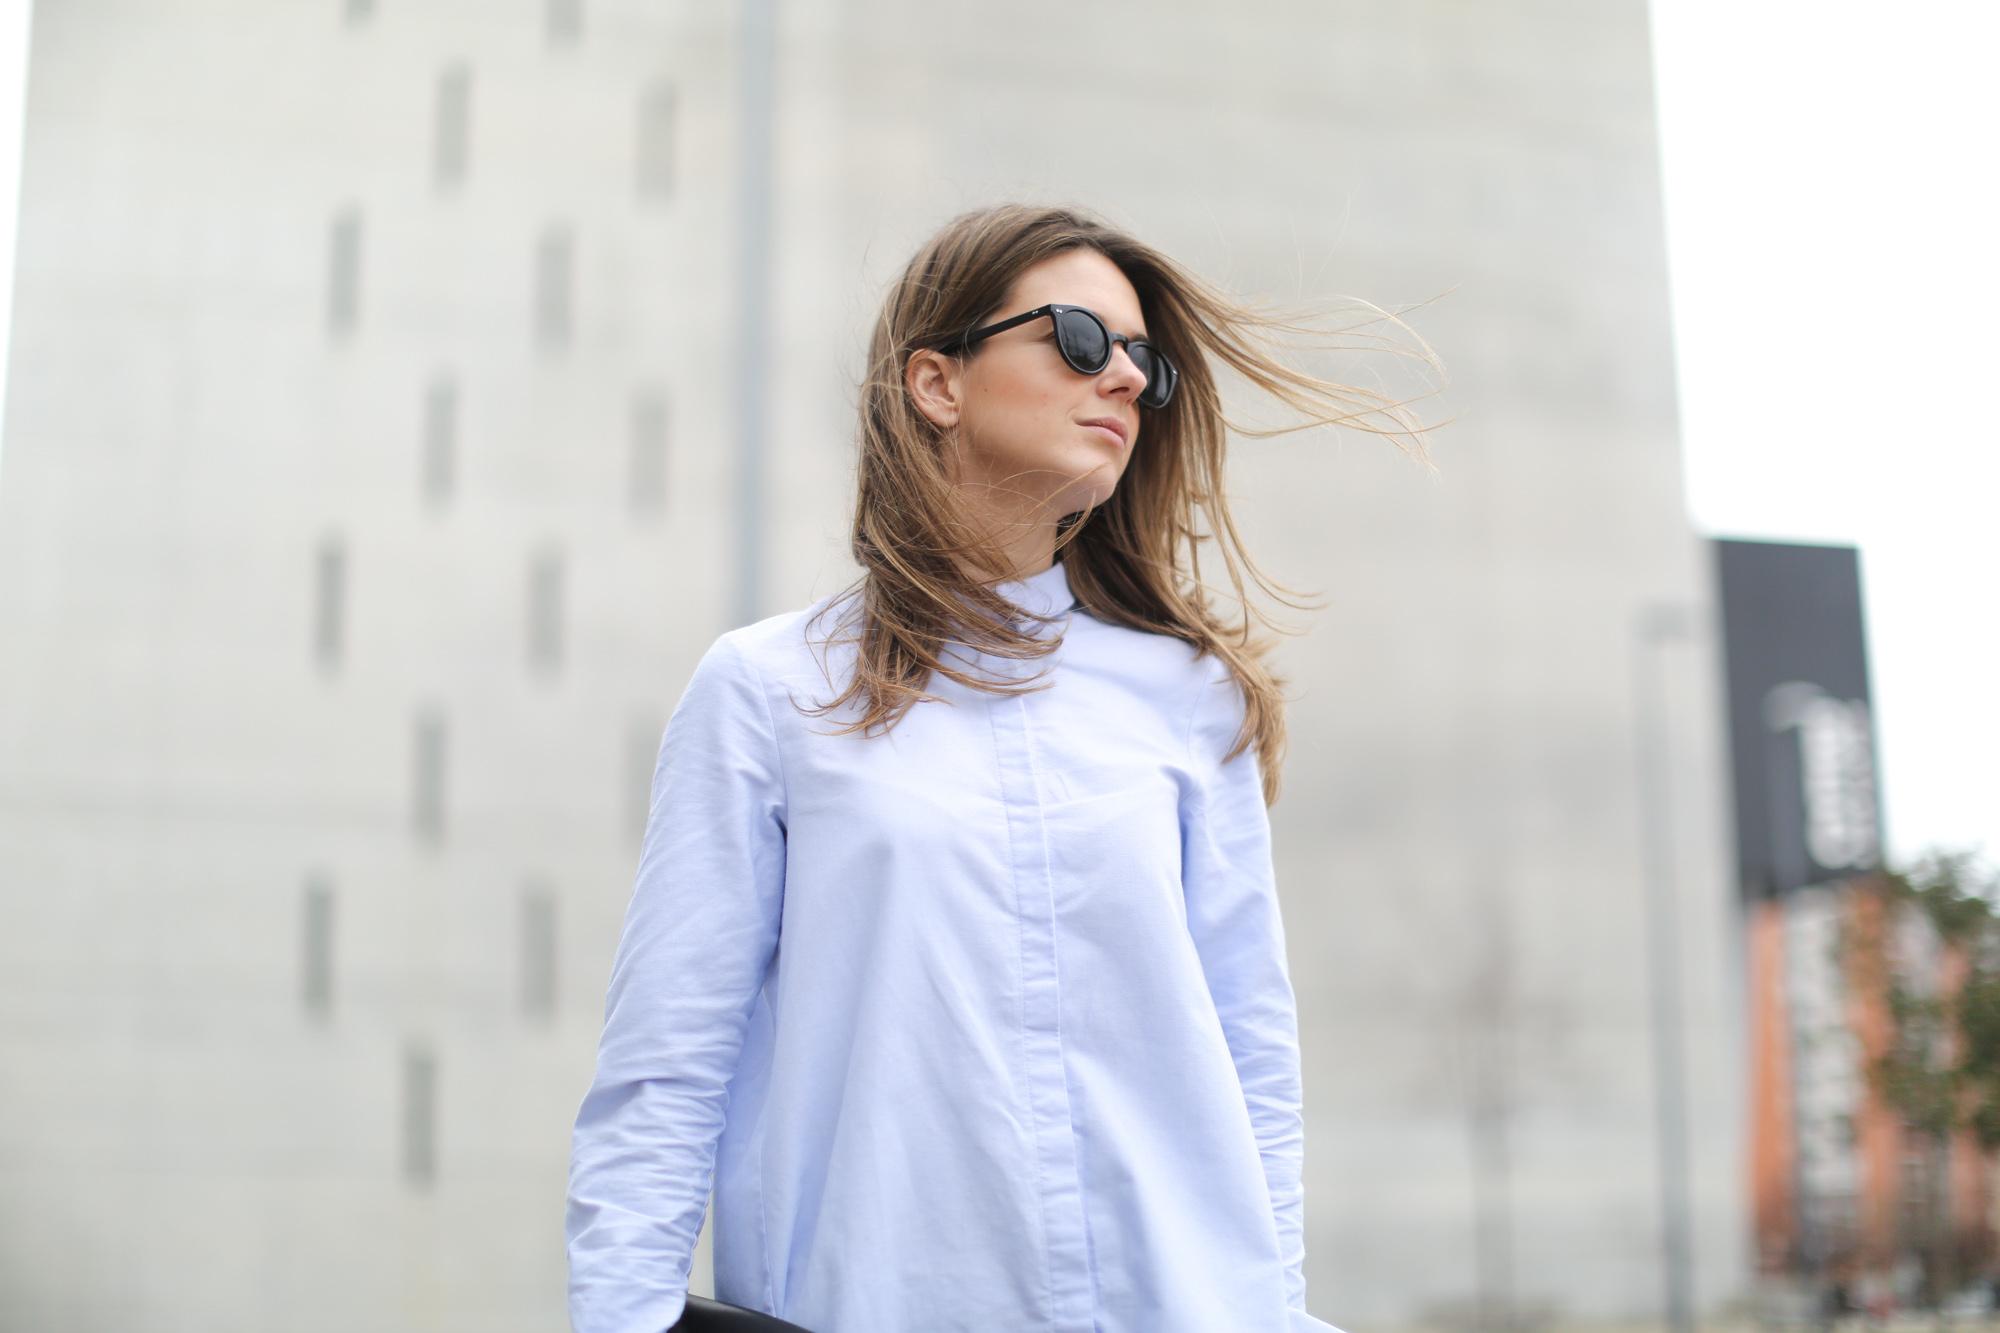 Clochet-streetstyle-h&m-trend-alpaca-wool-white-bomber-20